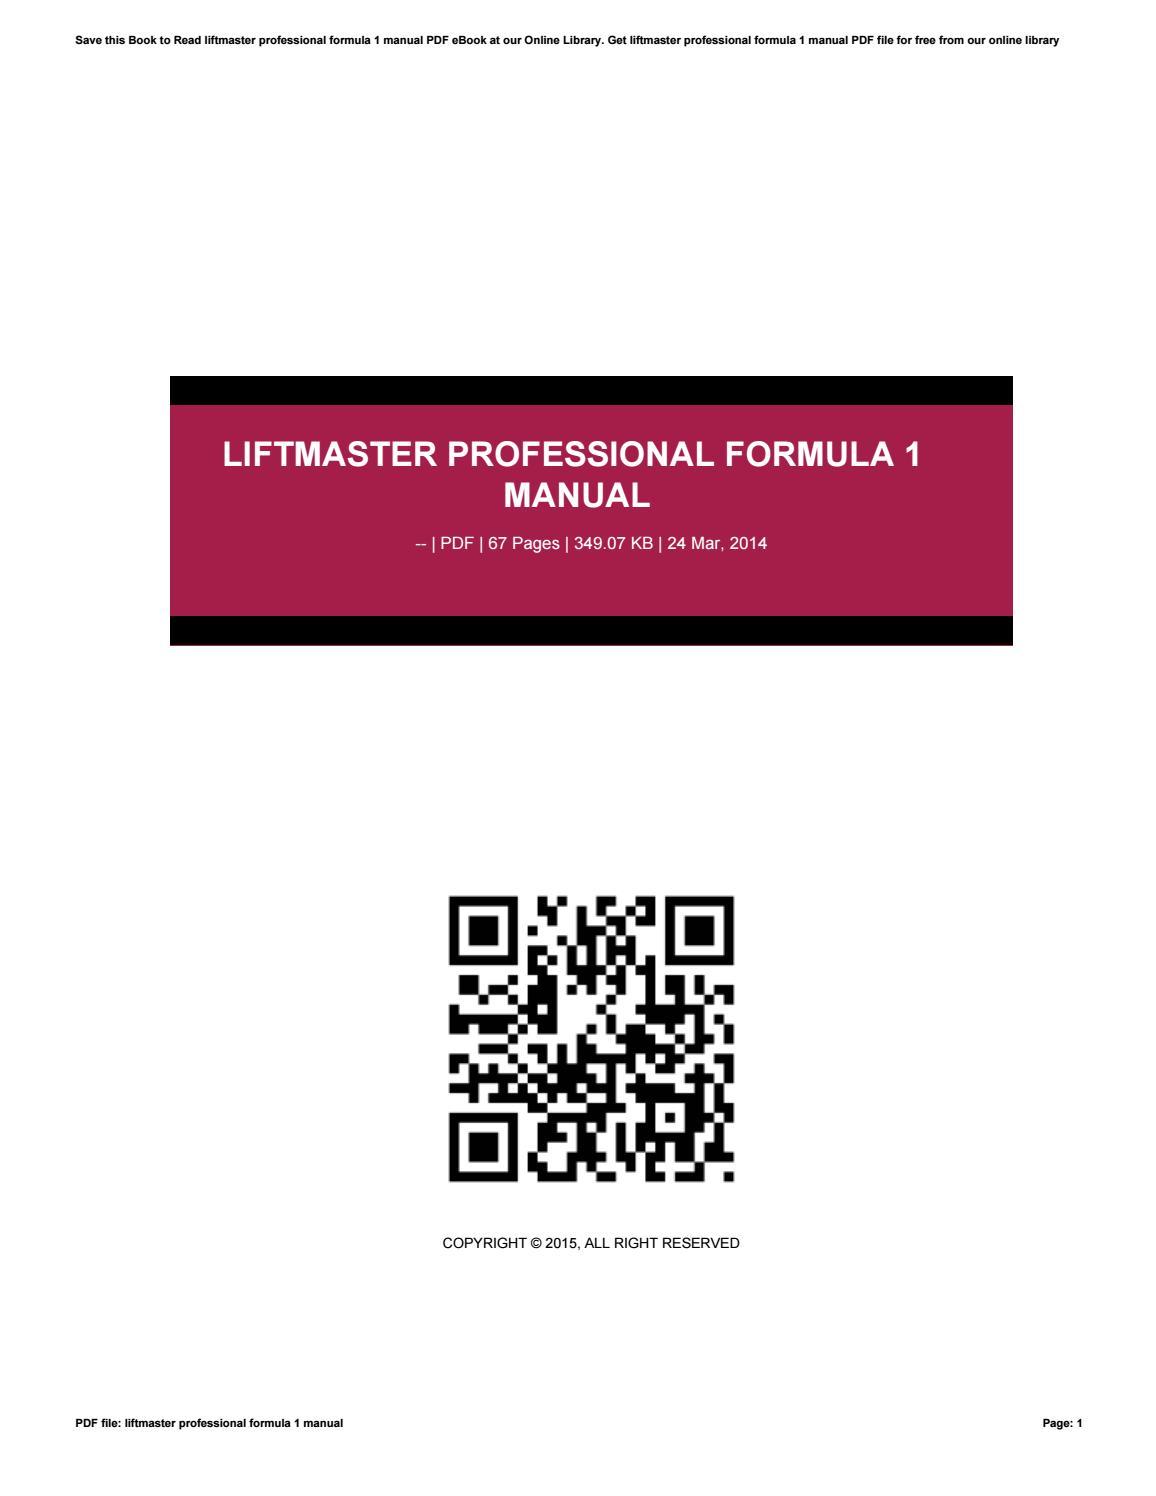 Liftmaster Professional Formula 1 Manual By 4tb03 Manual Guide